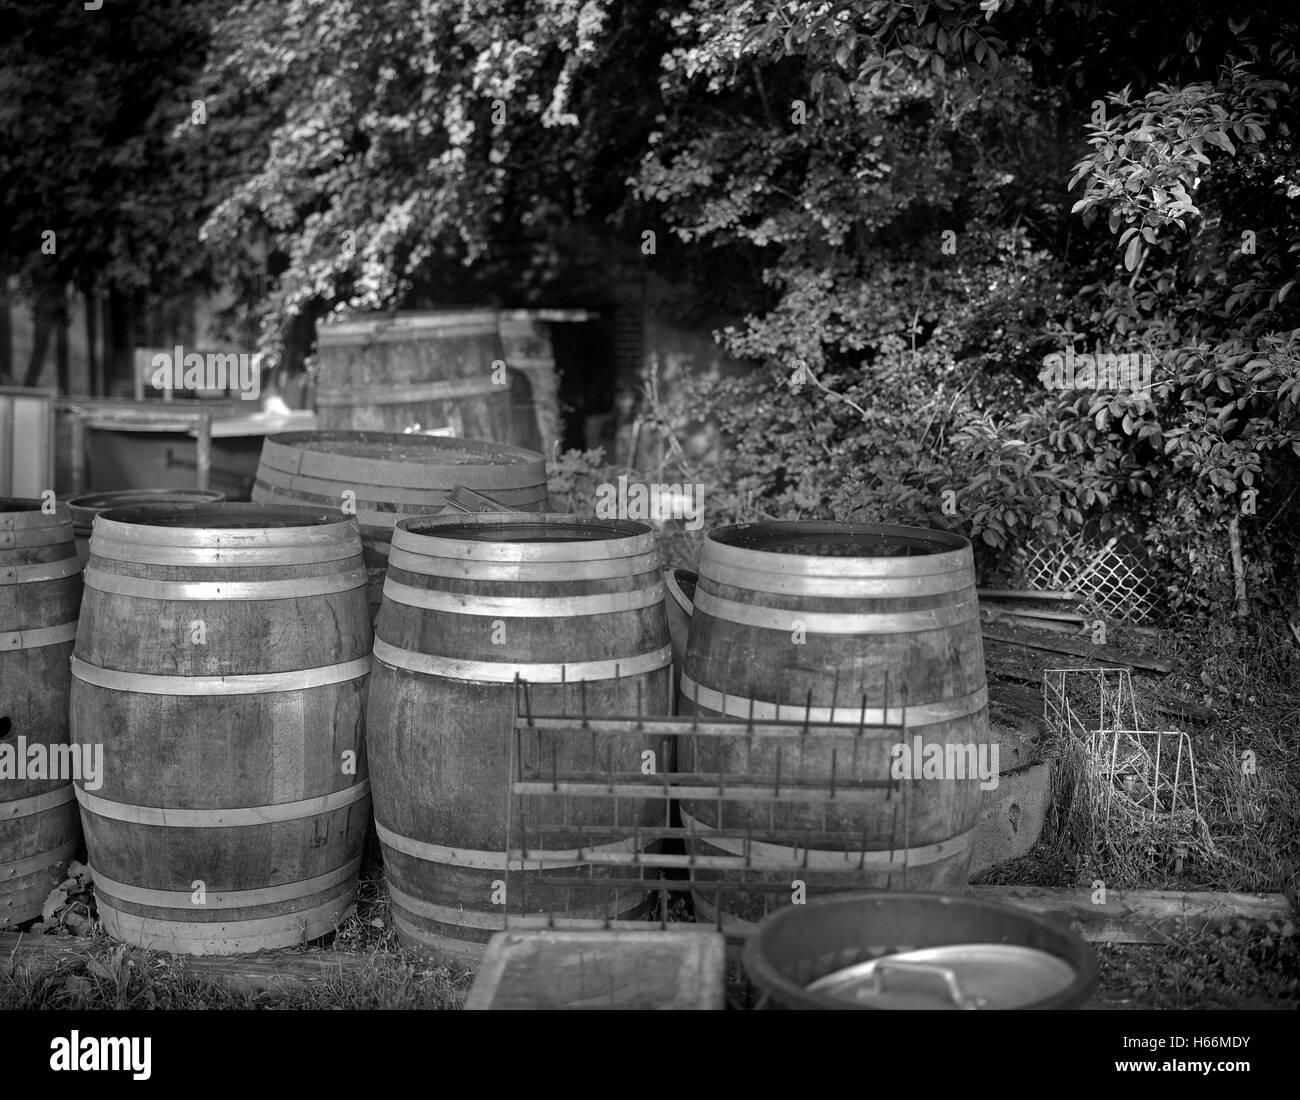 Mdy Pont L Eveque calvados black and white stock photos & images - alamy